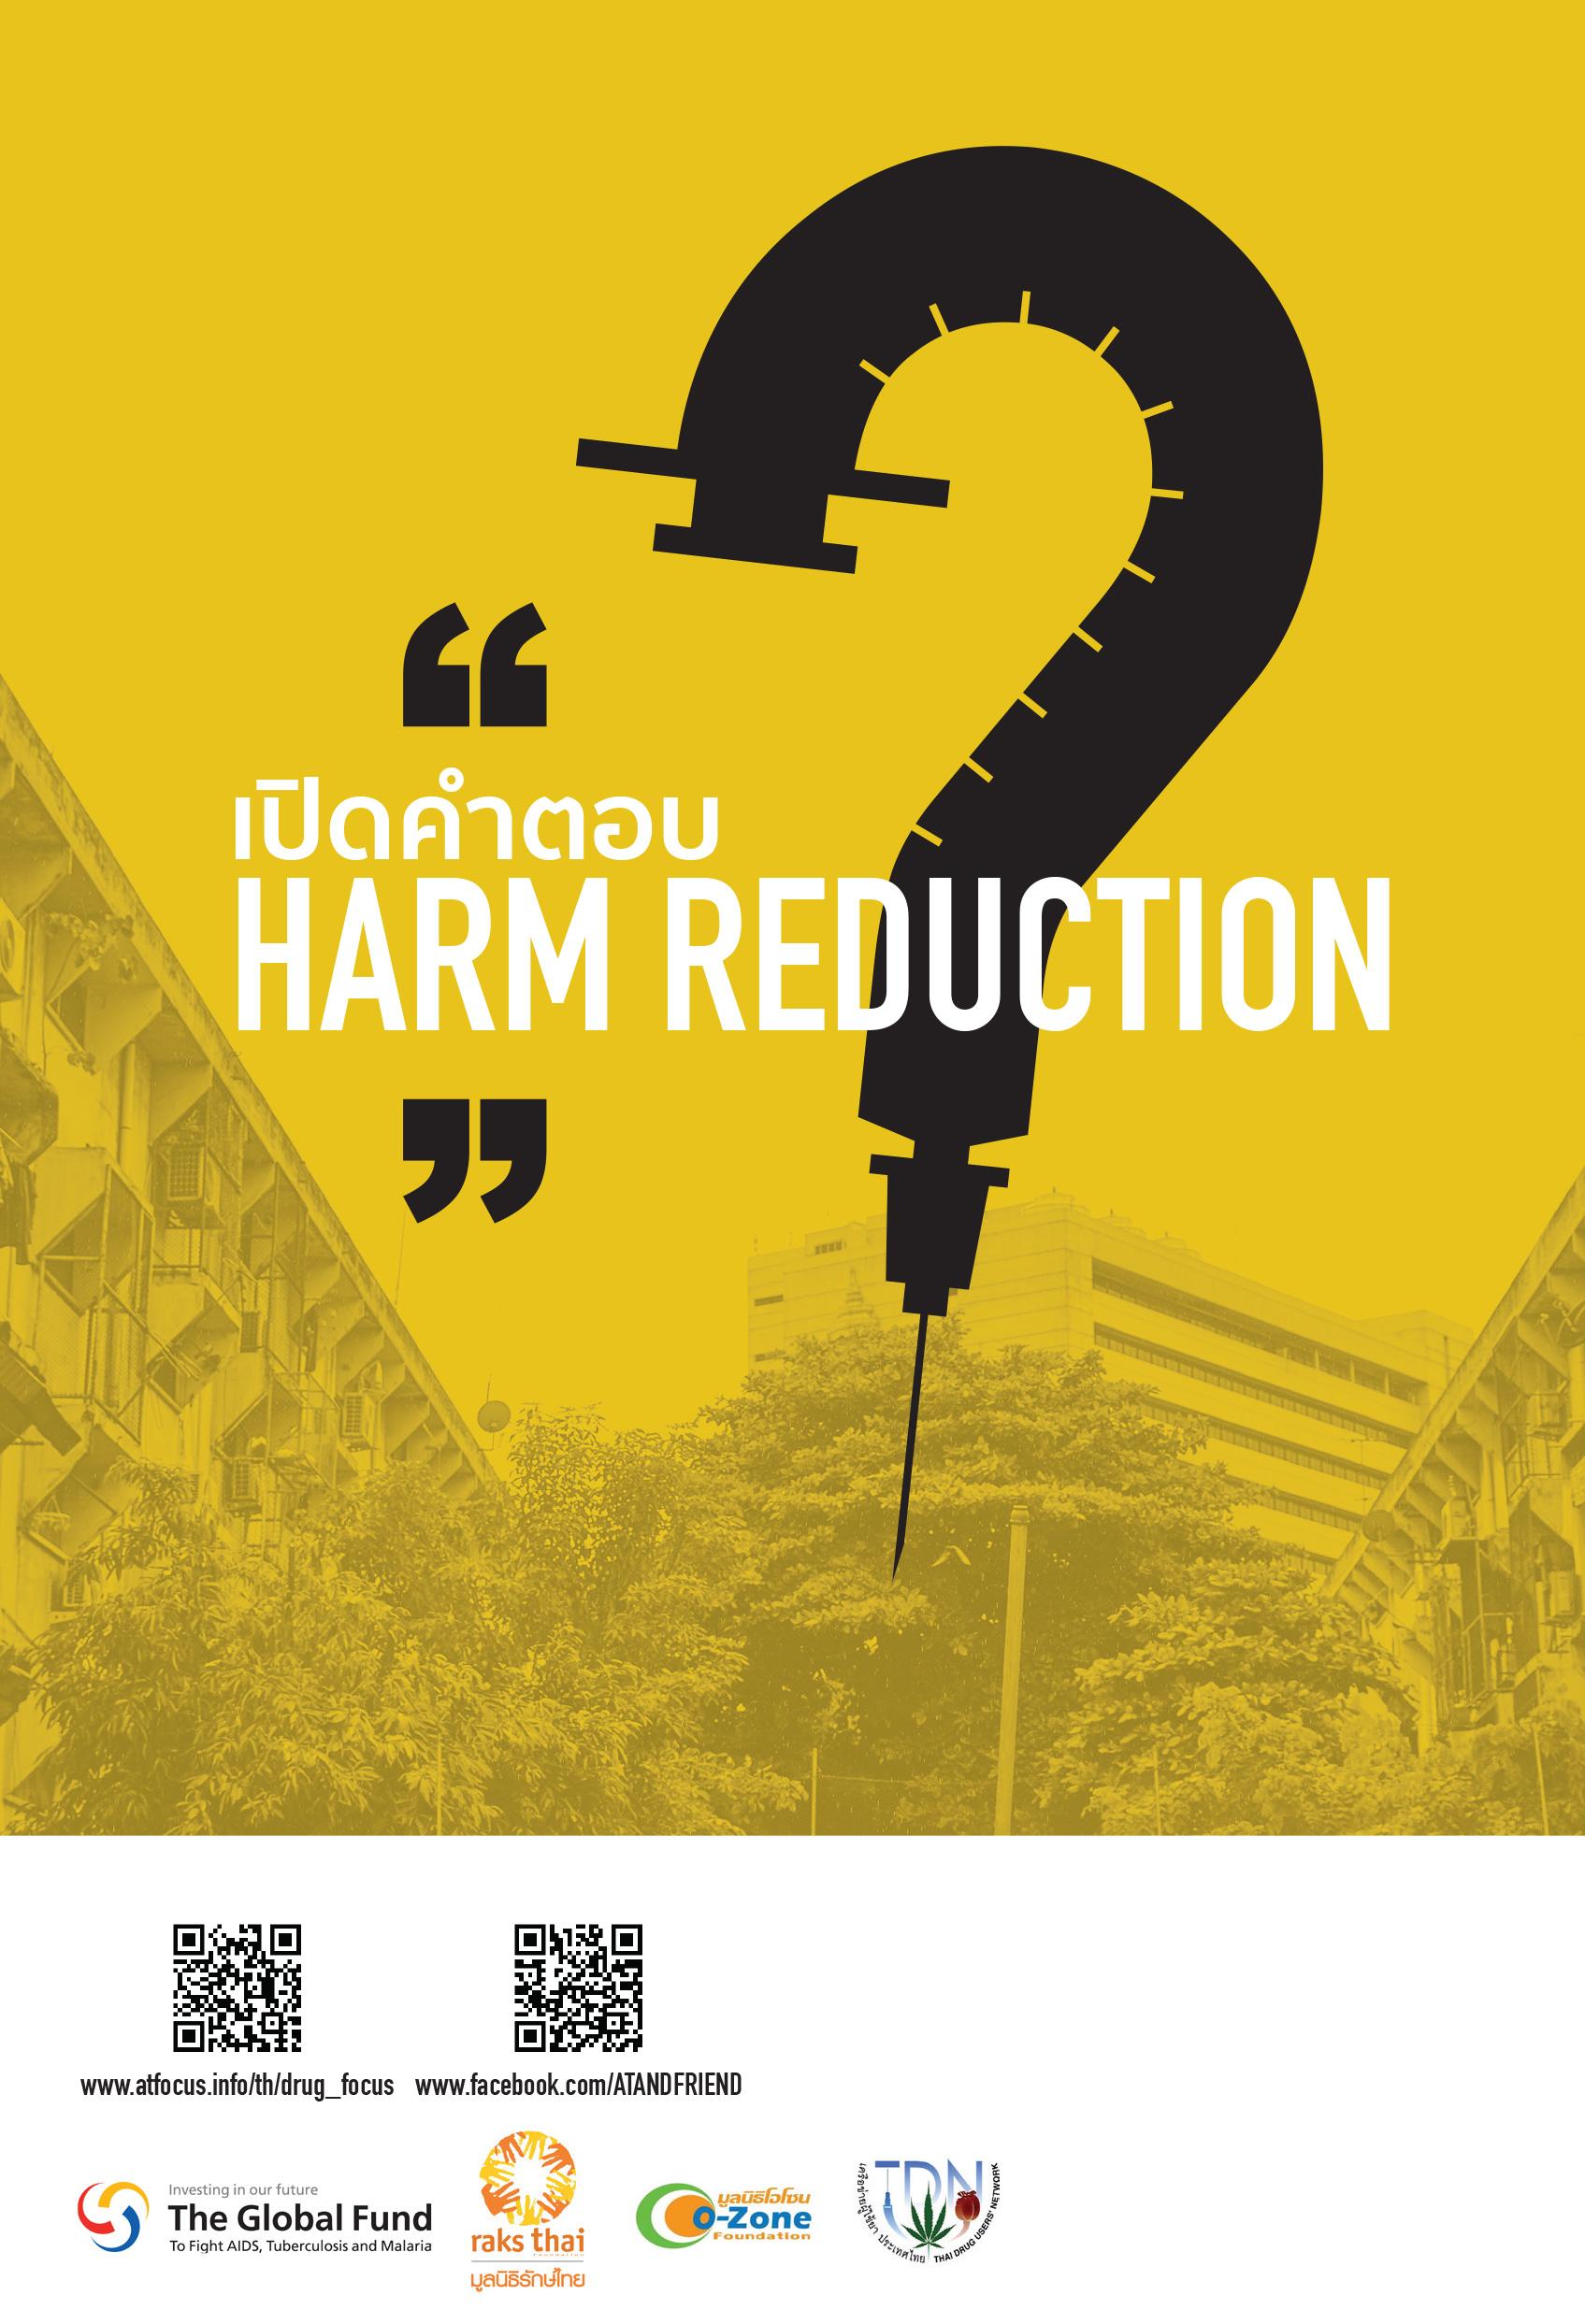 Harm Reduction_v3 mhai.indd